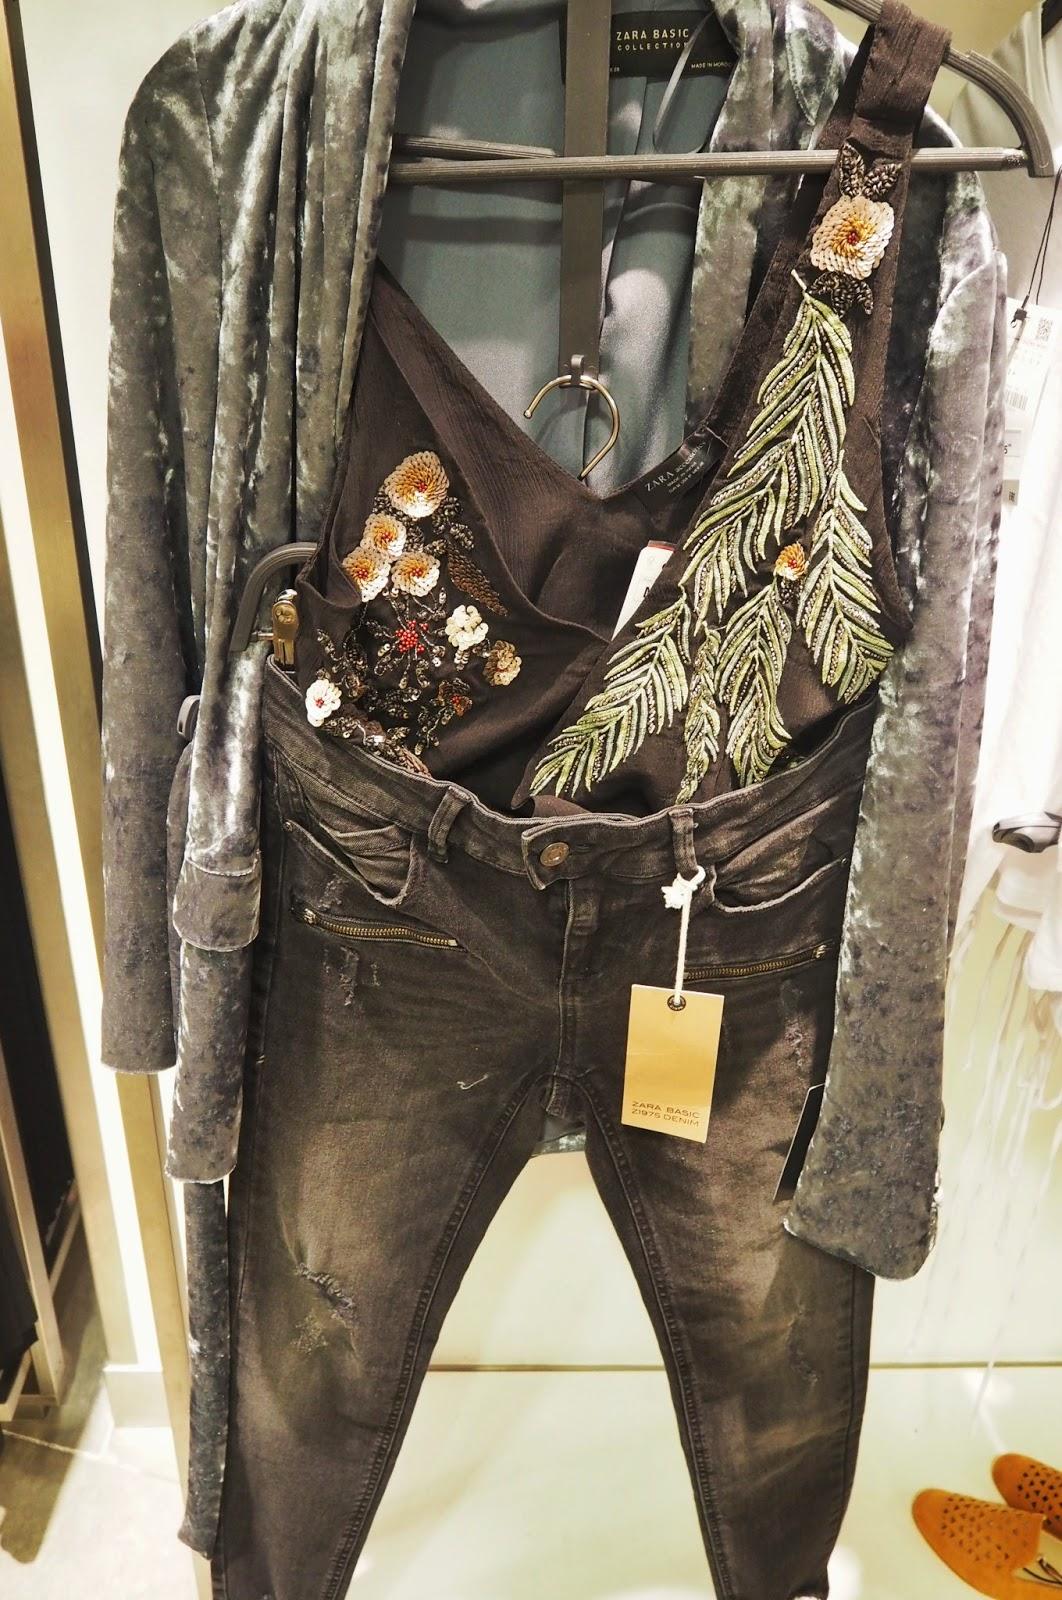 Zara - Tropical emboidered bodysuit